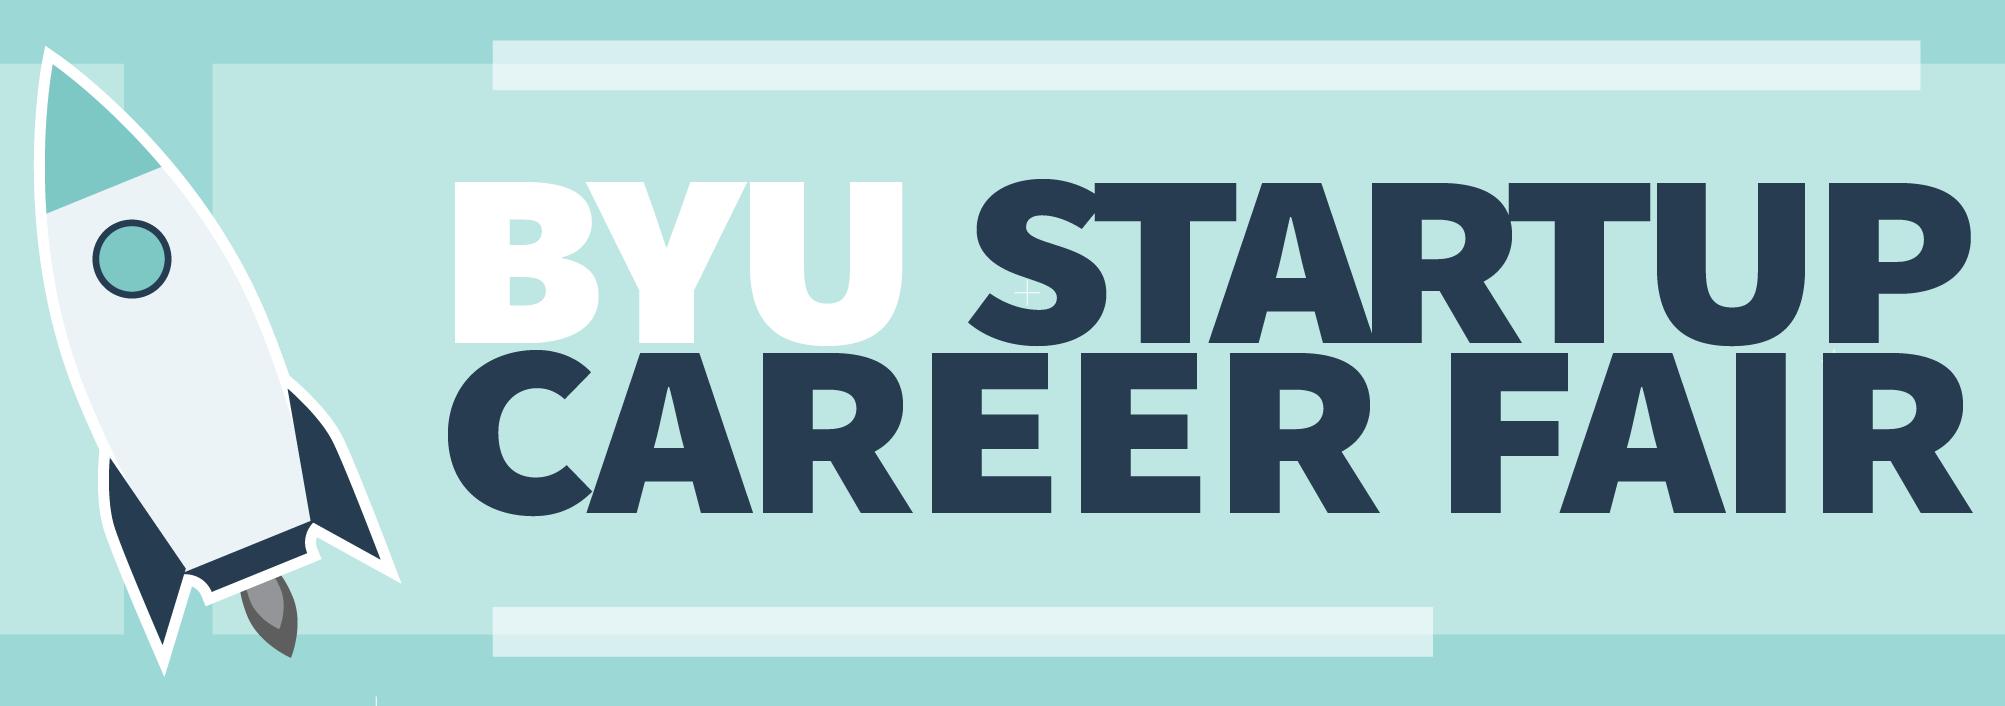 byu startup career fair logo